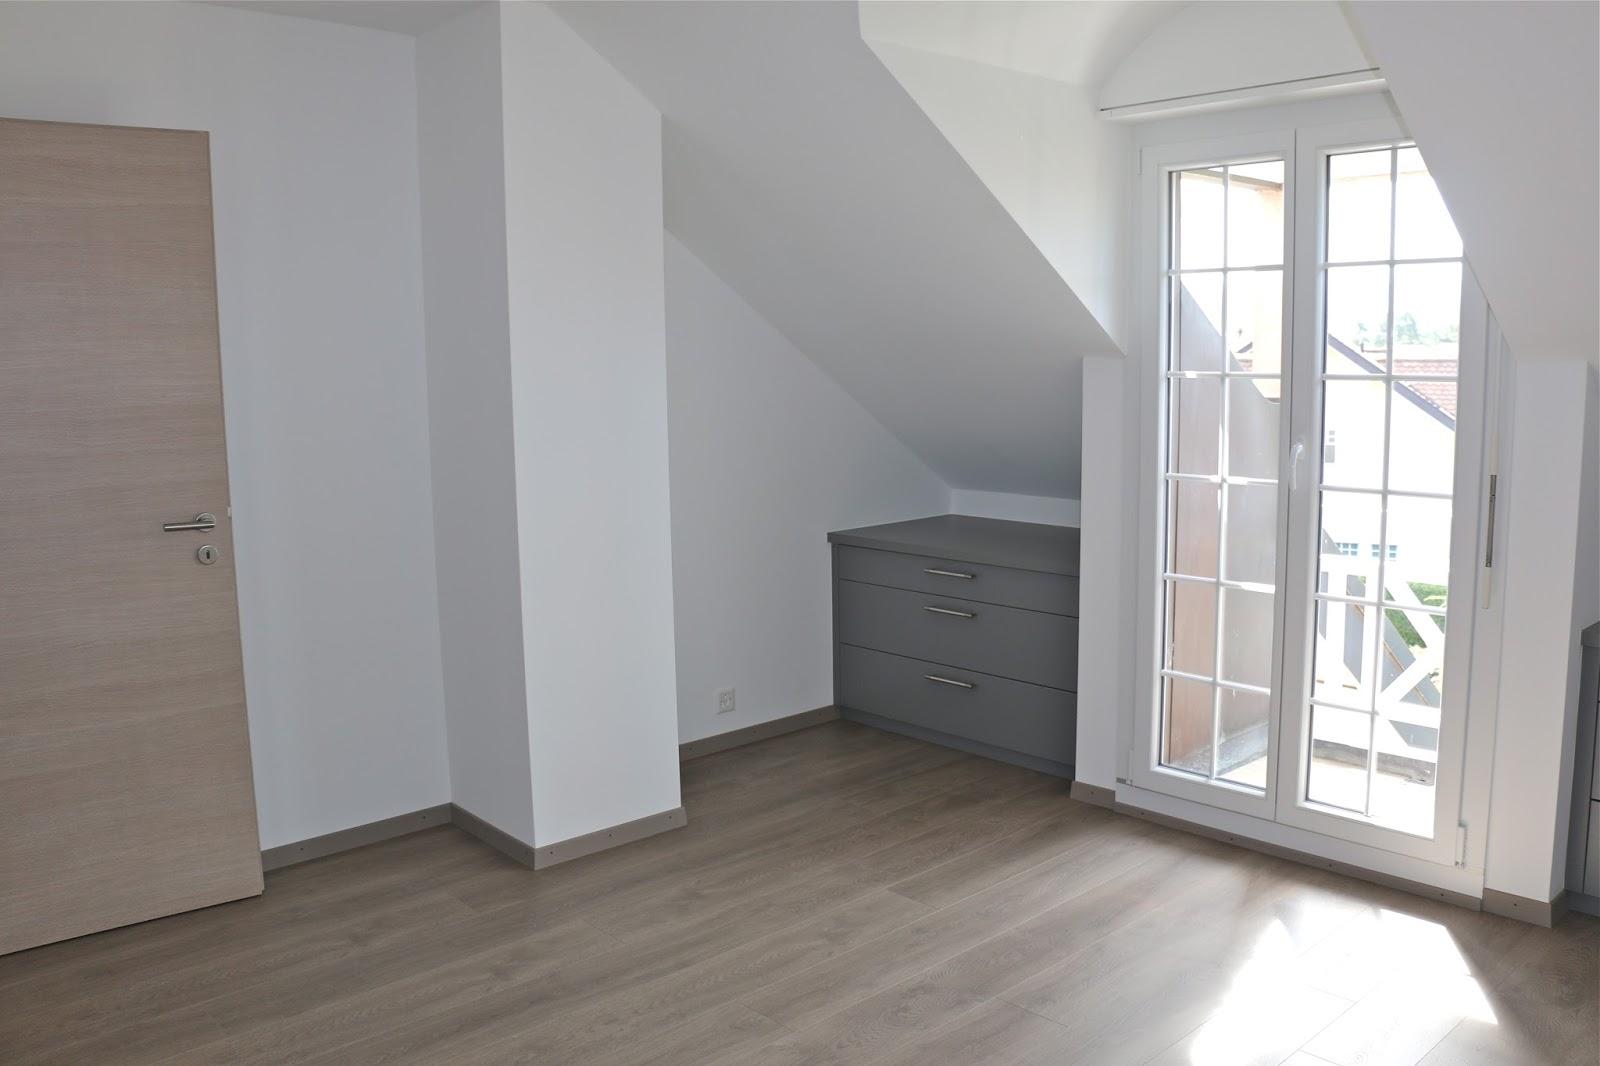 comment poser une fen tre. Black Bedroom Furniture Sets. Home Design Ideas